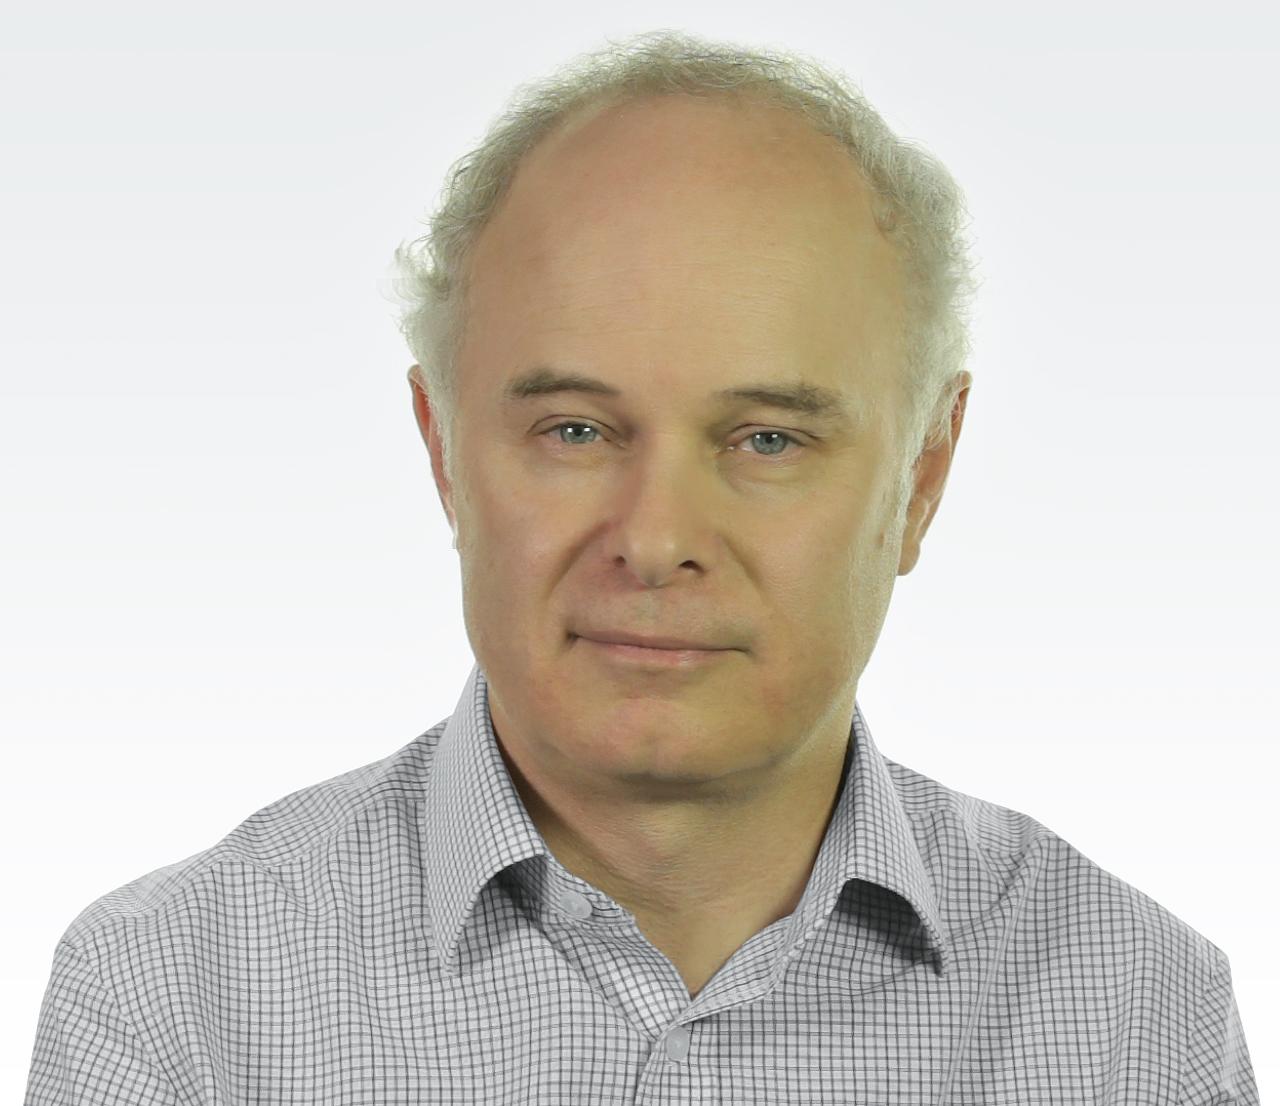 Andy Wilton, CIO of Claranet